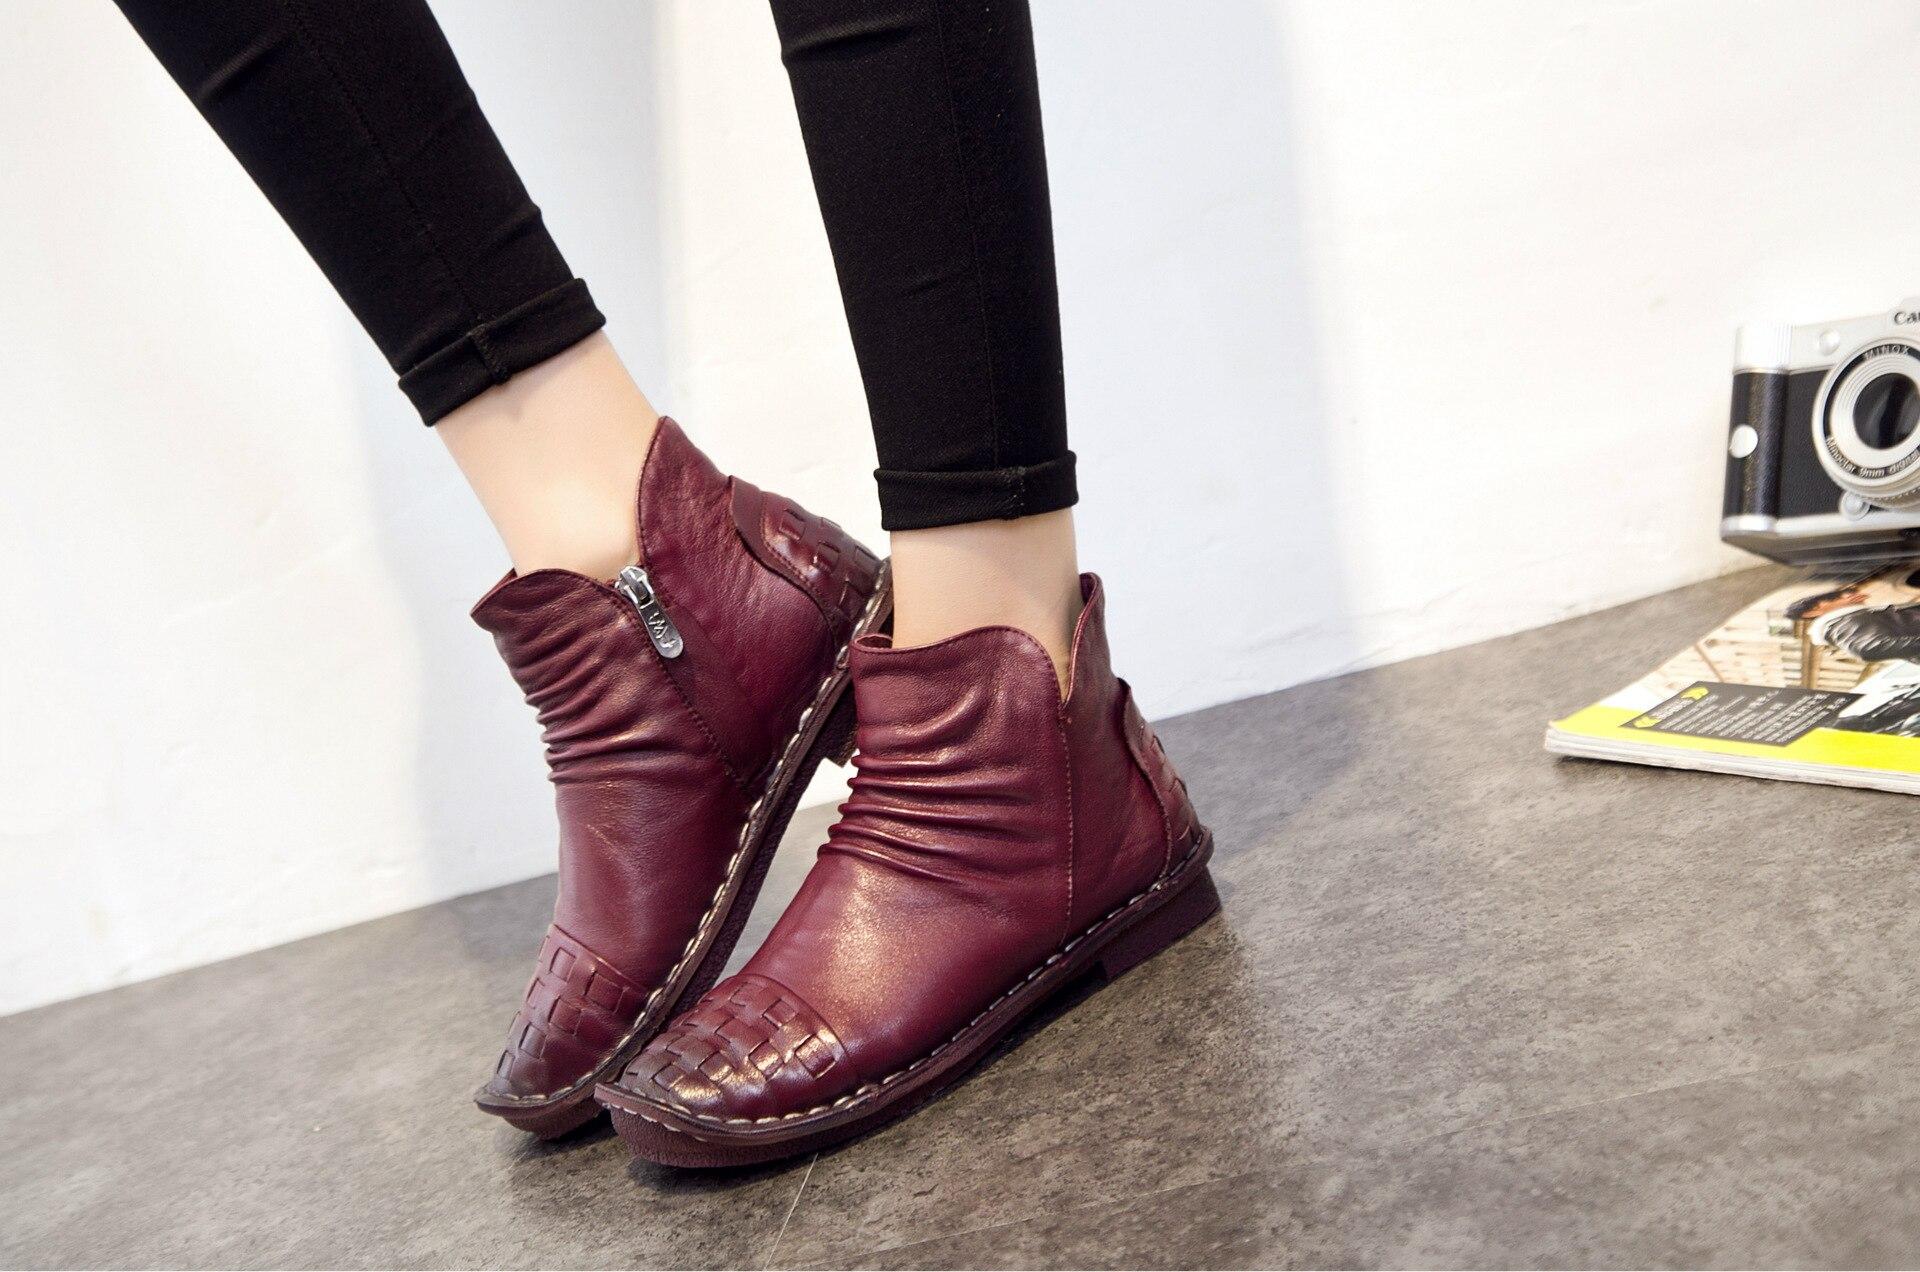 2018 Women Autumn and Winter Warm Snow Boots Waterproof